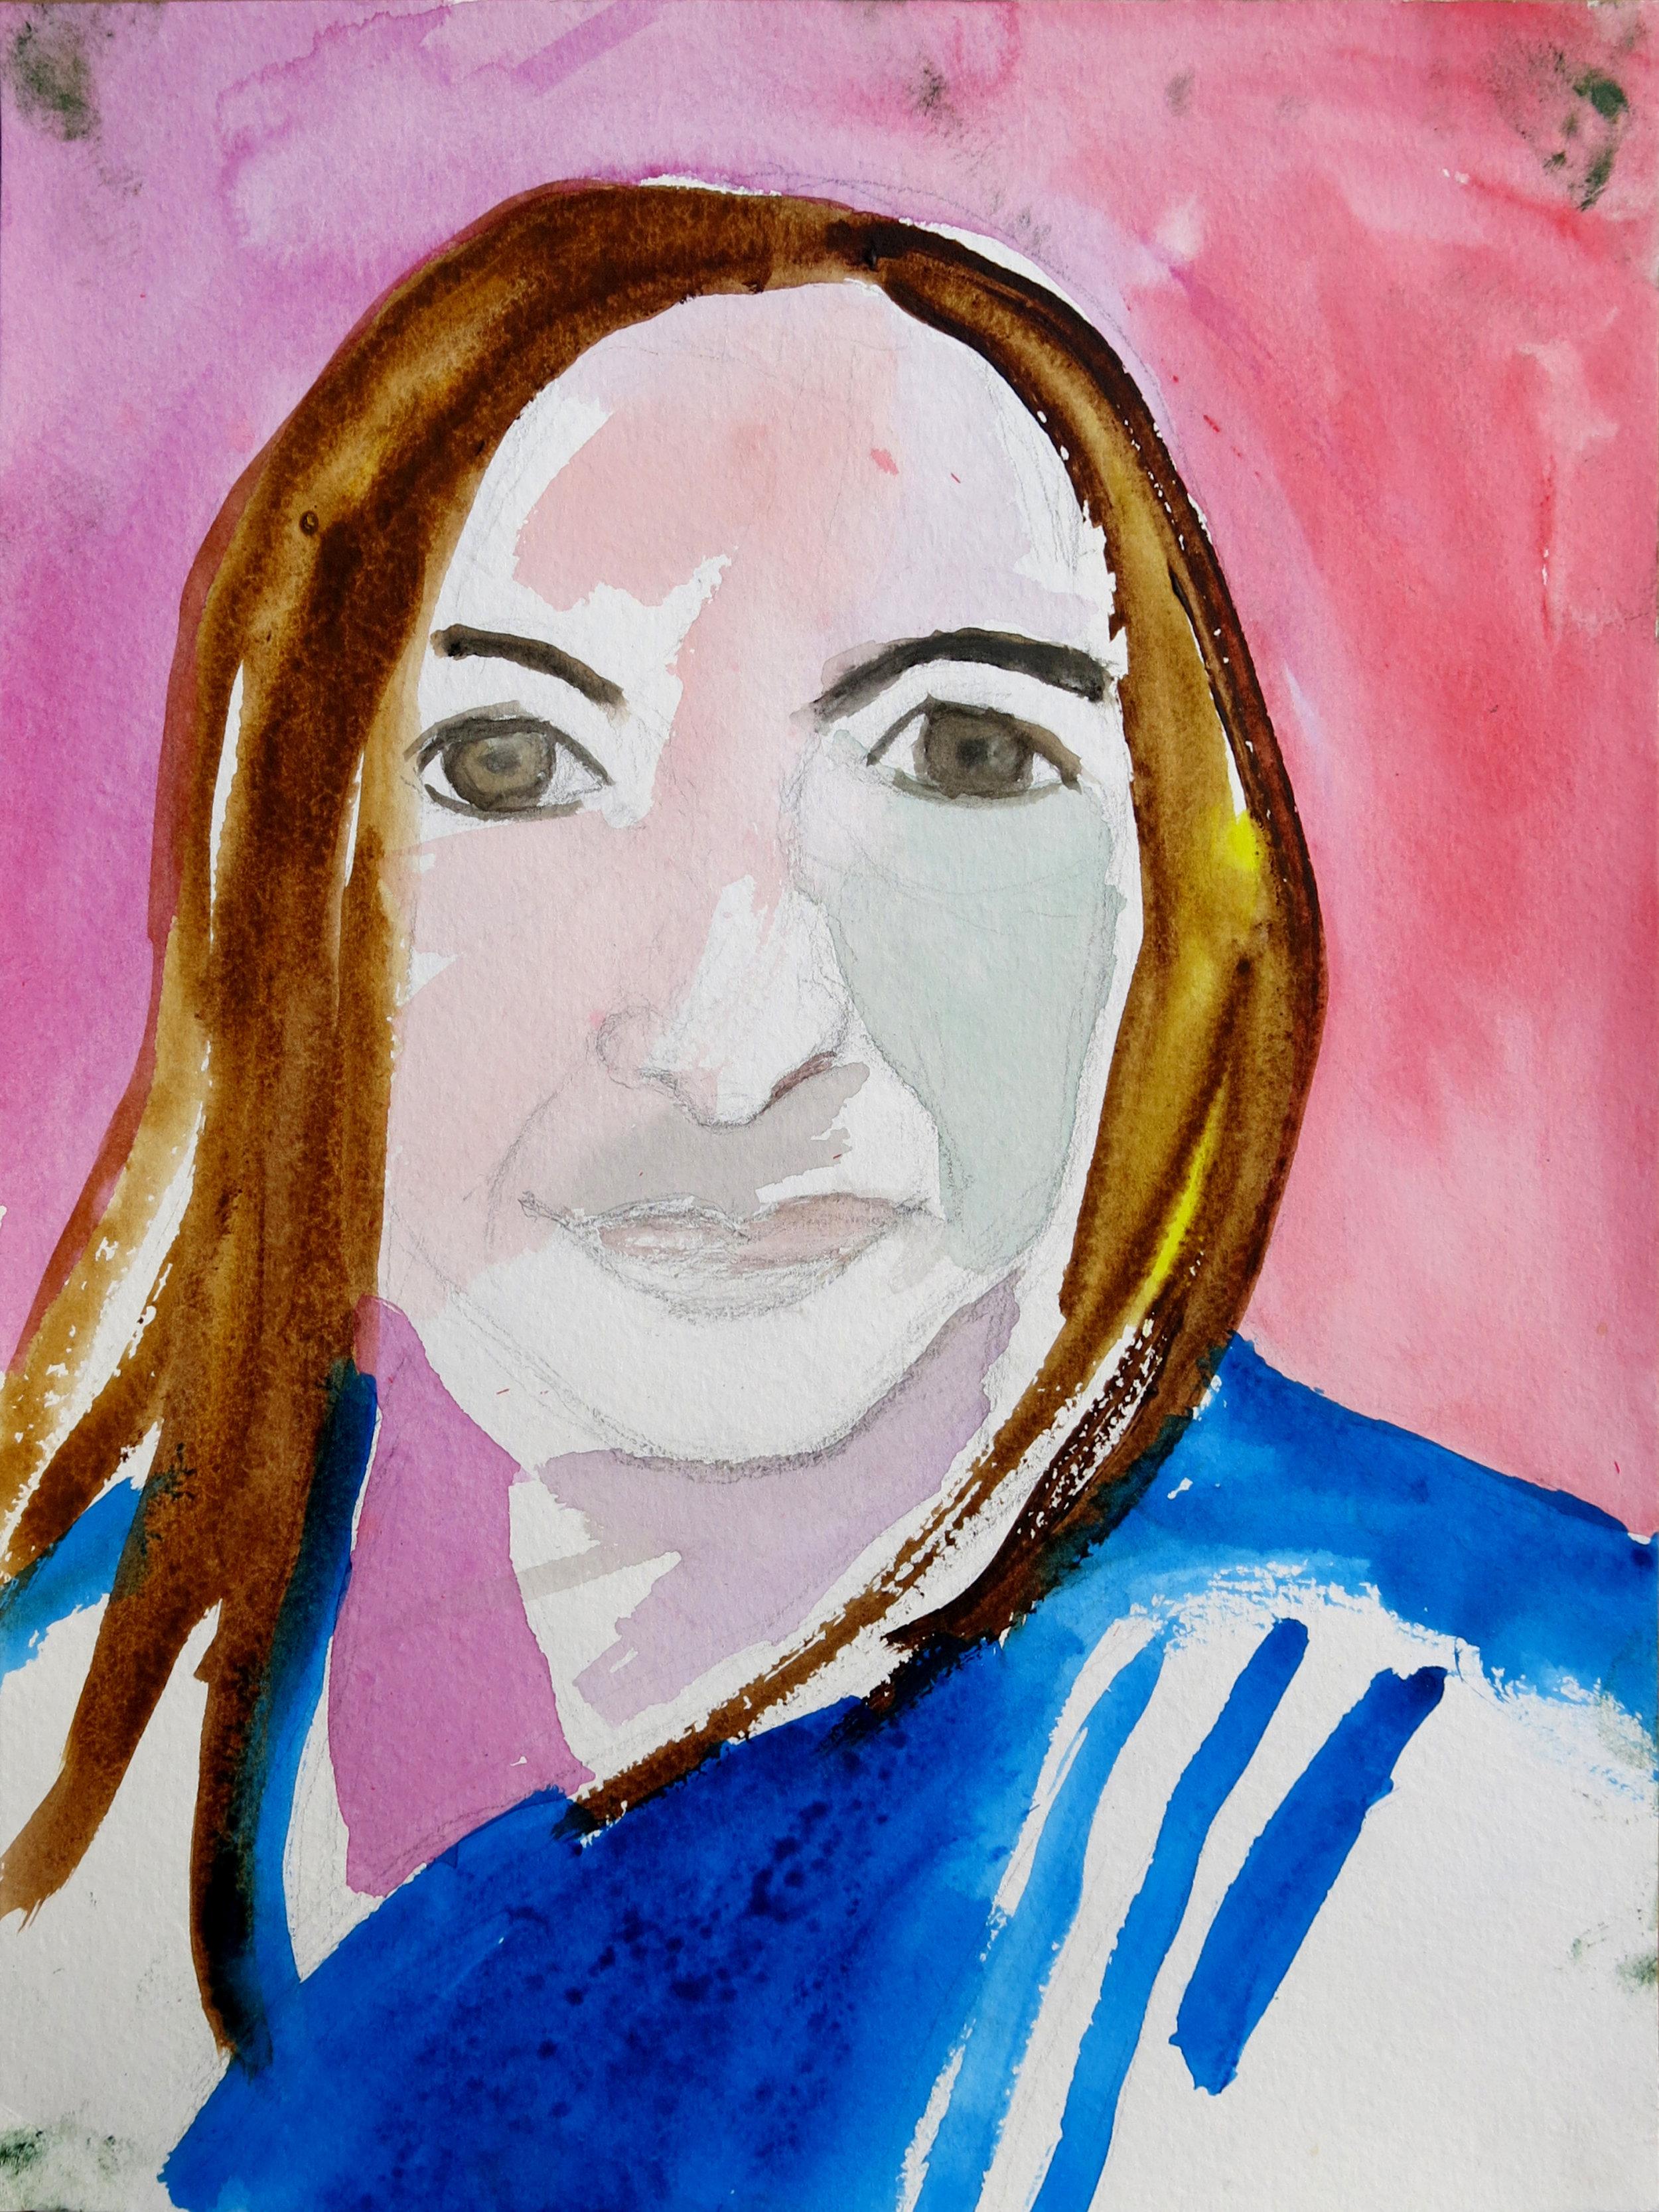 Barbra Streisand Portrait #83